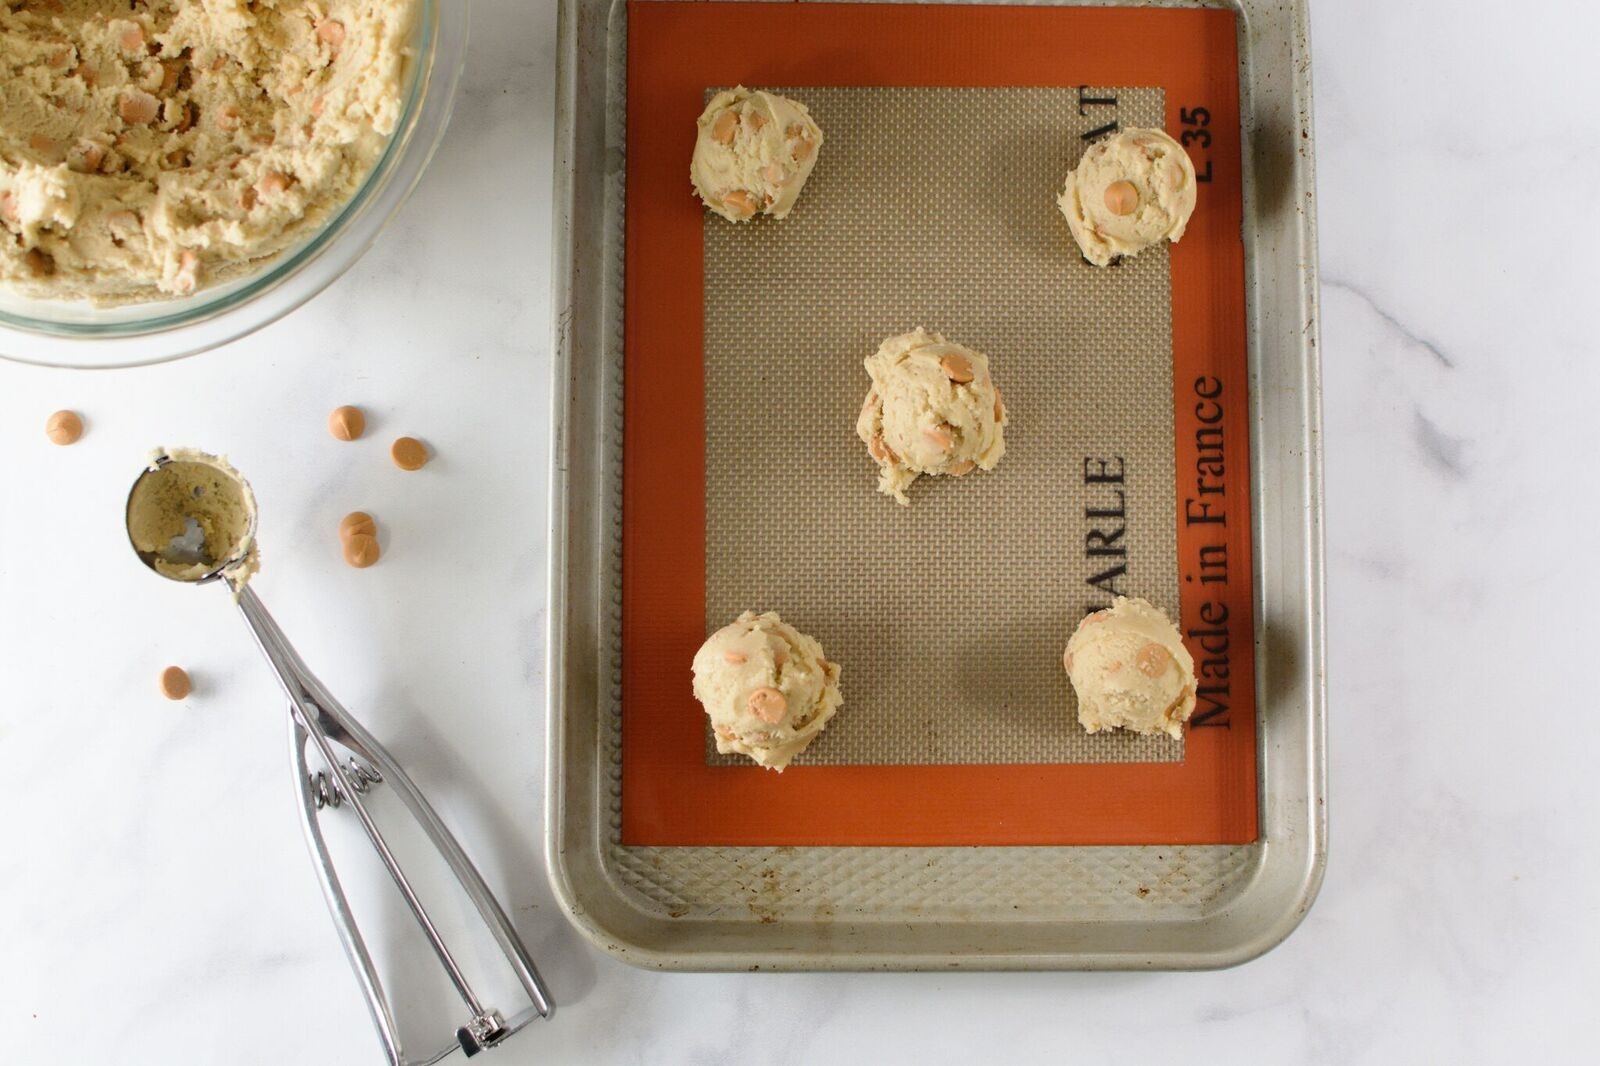 Cookie dough drops on a baking sheet